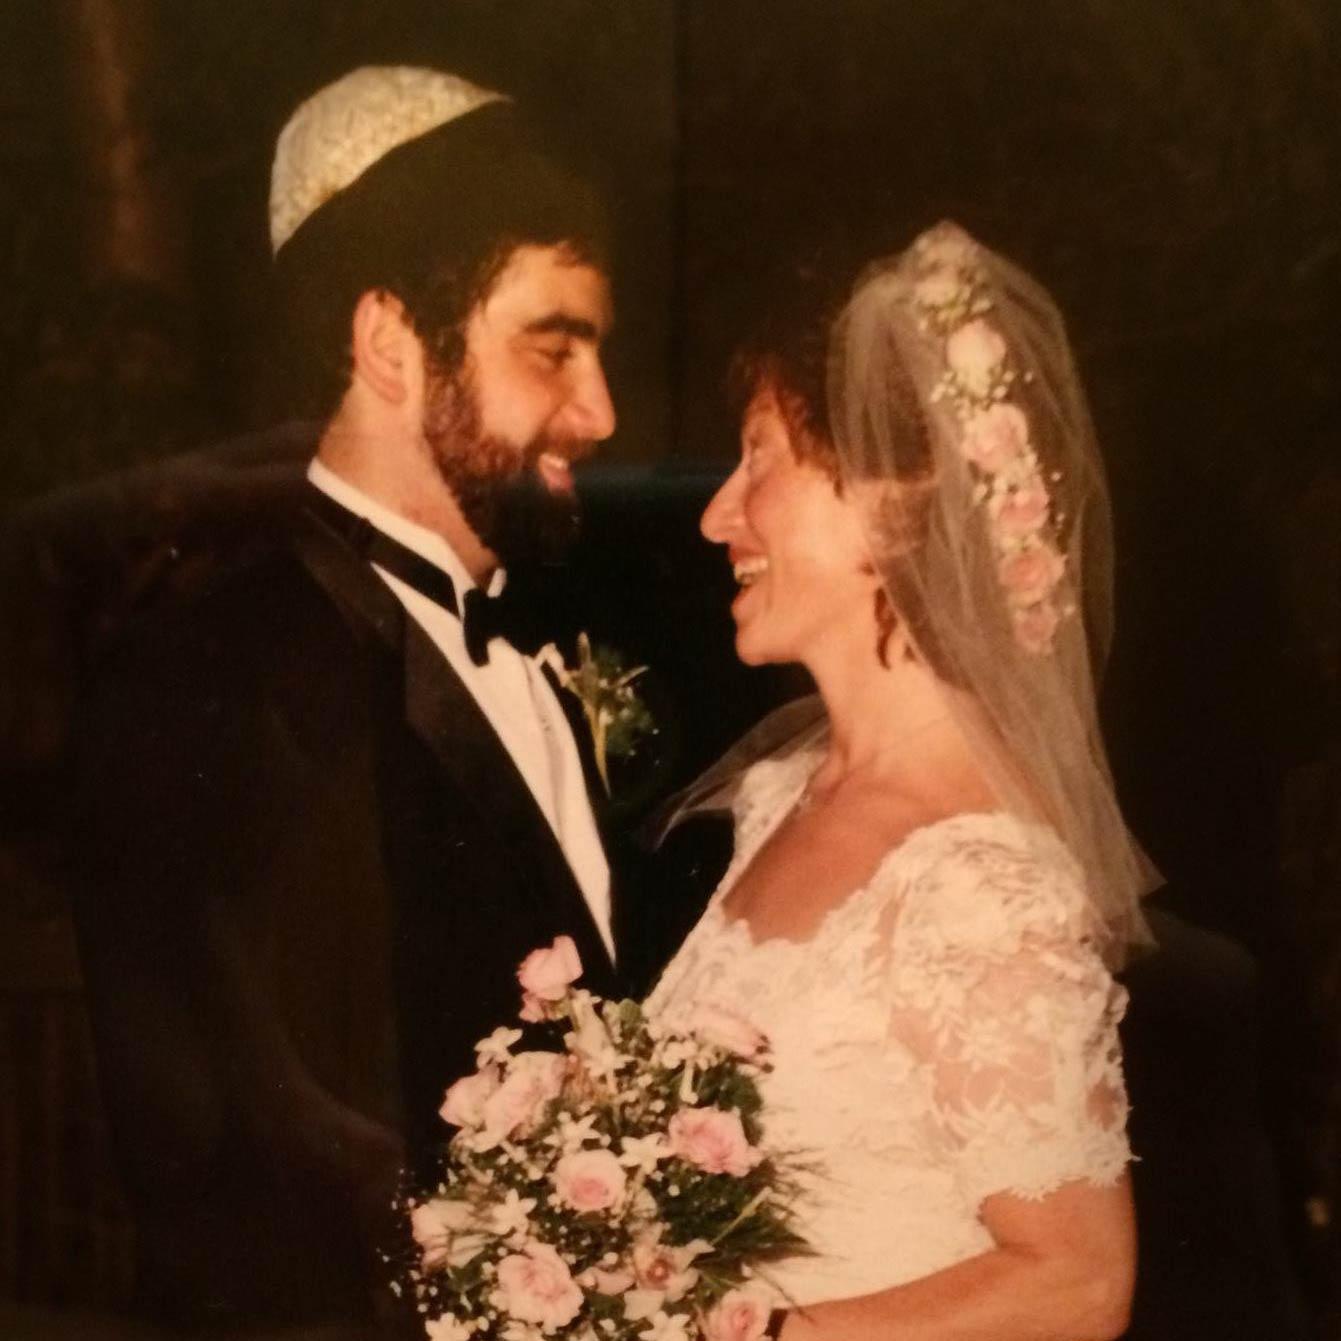 Stewart and Shoshannah wedding